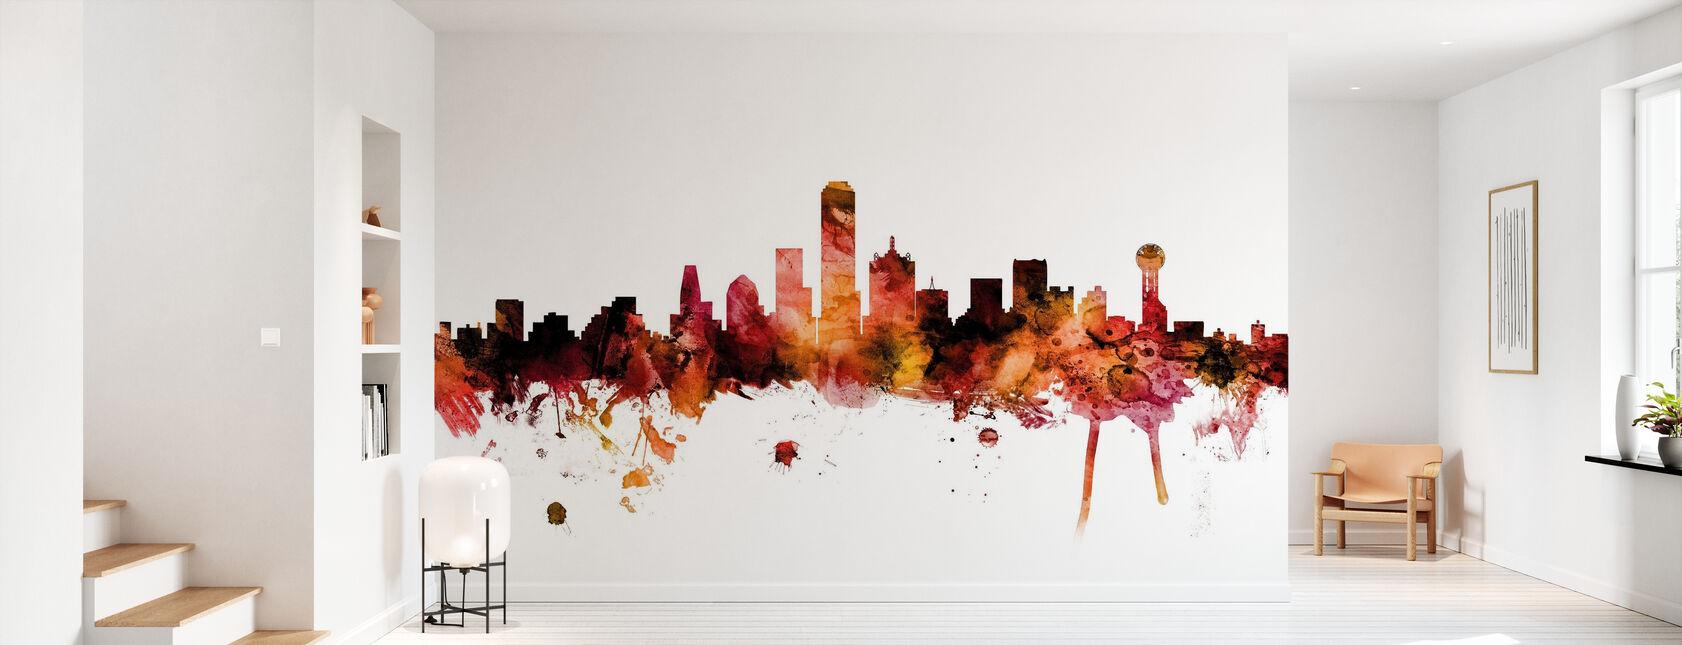 Dallas Texas Skyline - Wallpaper - Hallway